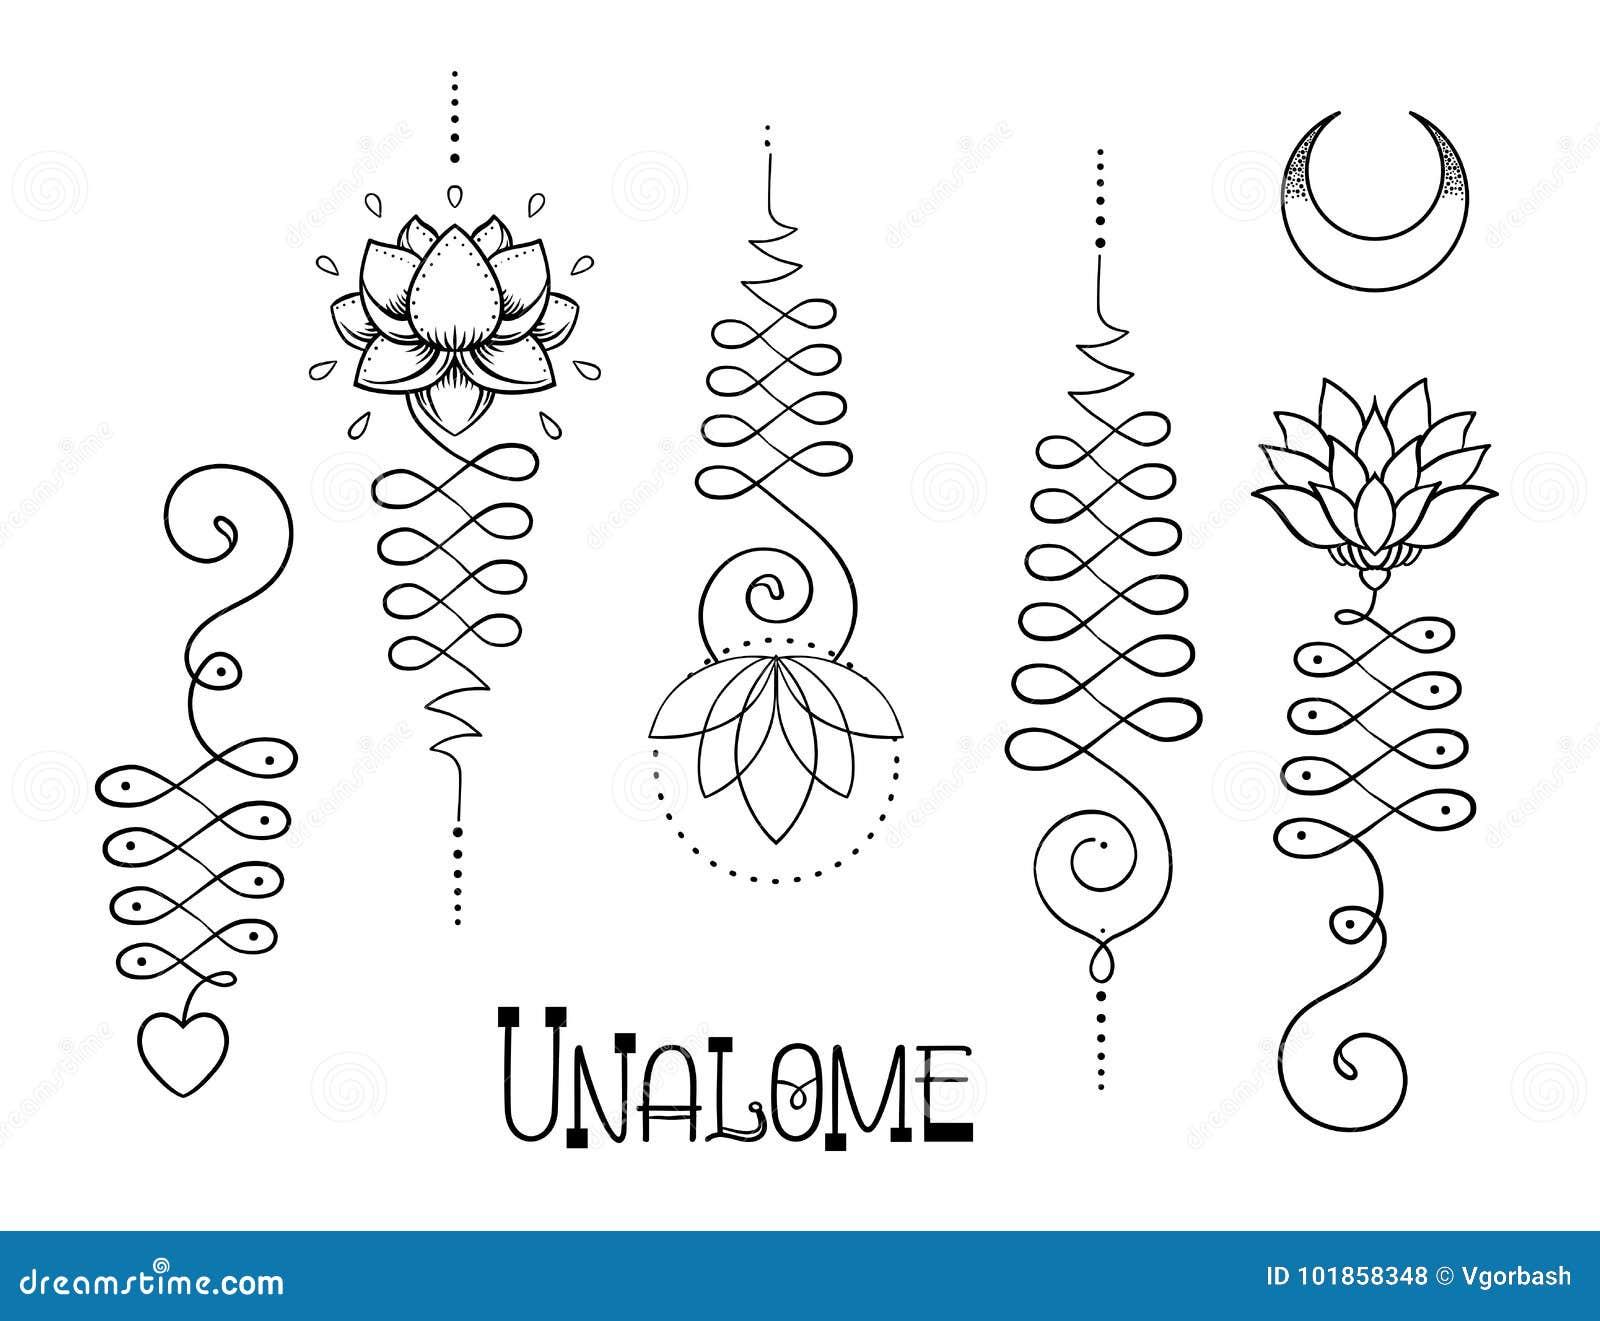 Lotus and sacred geometry unamole hindu symbol of wisdom and pa download lotus and sacred geometry unamole hindu symbol of wisdom and pa stock vector mightylinksfo